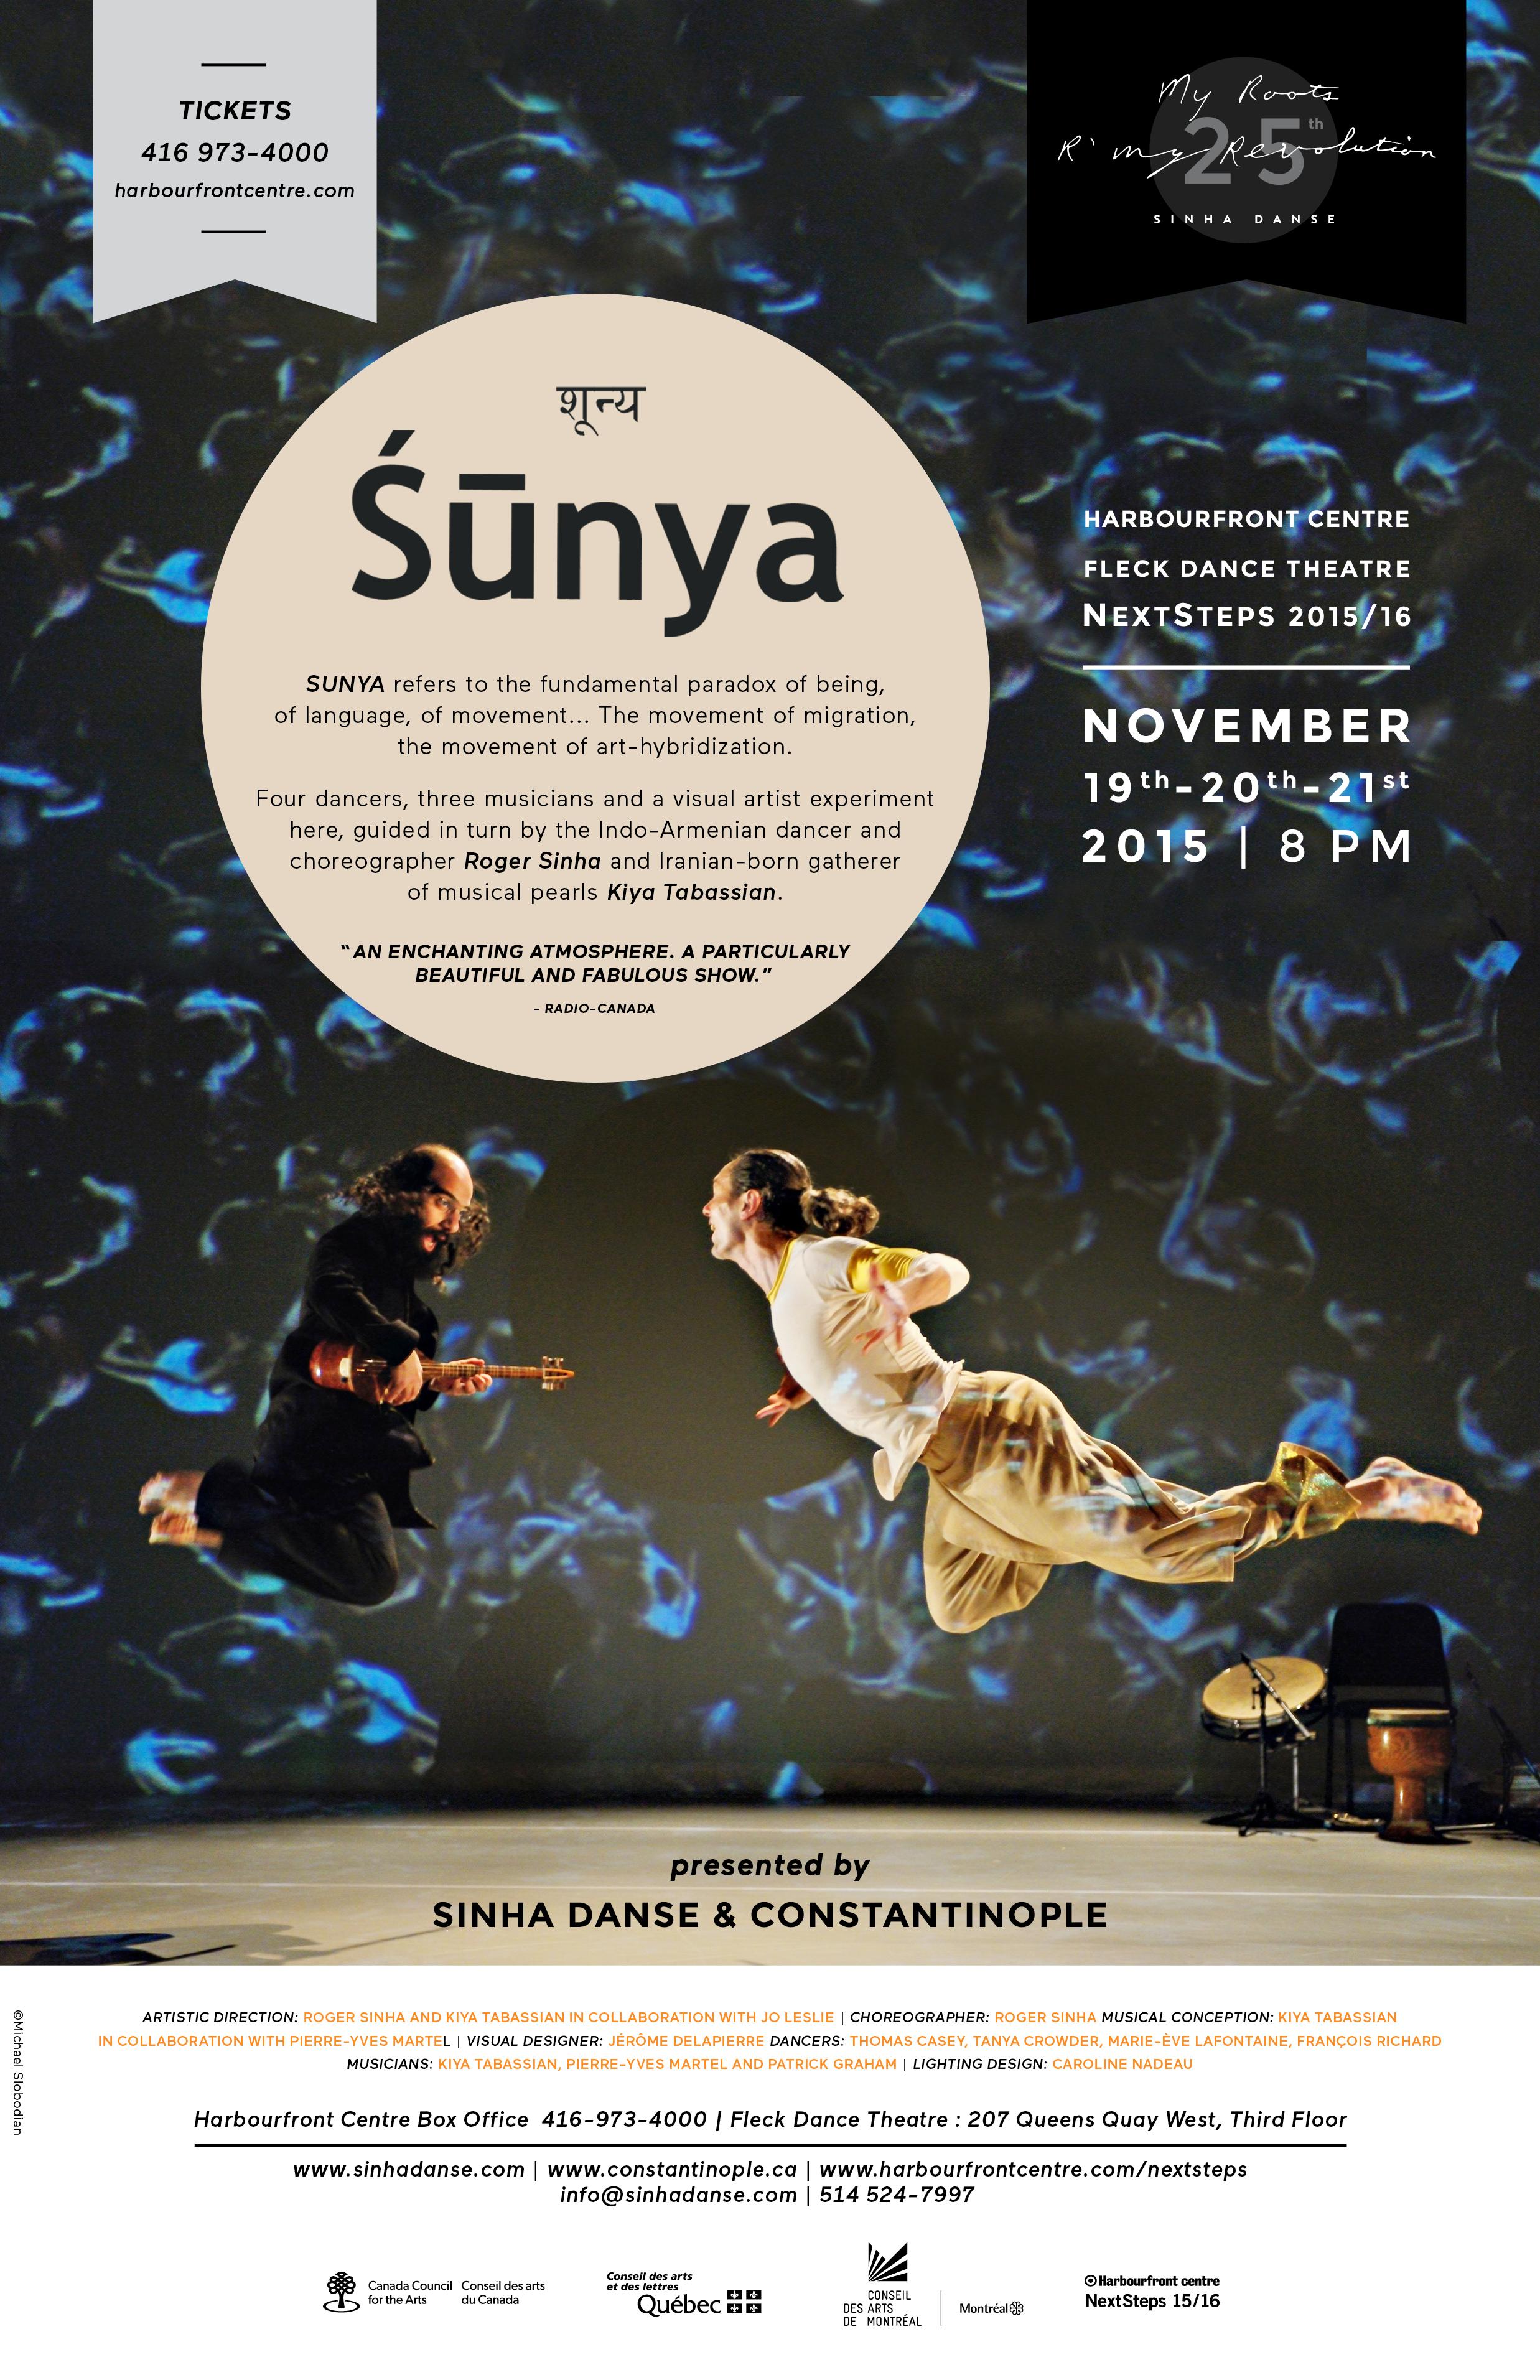 SINHA_sunya_eflyer-FINAL1-300dpi